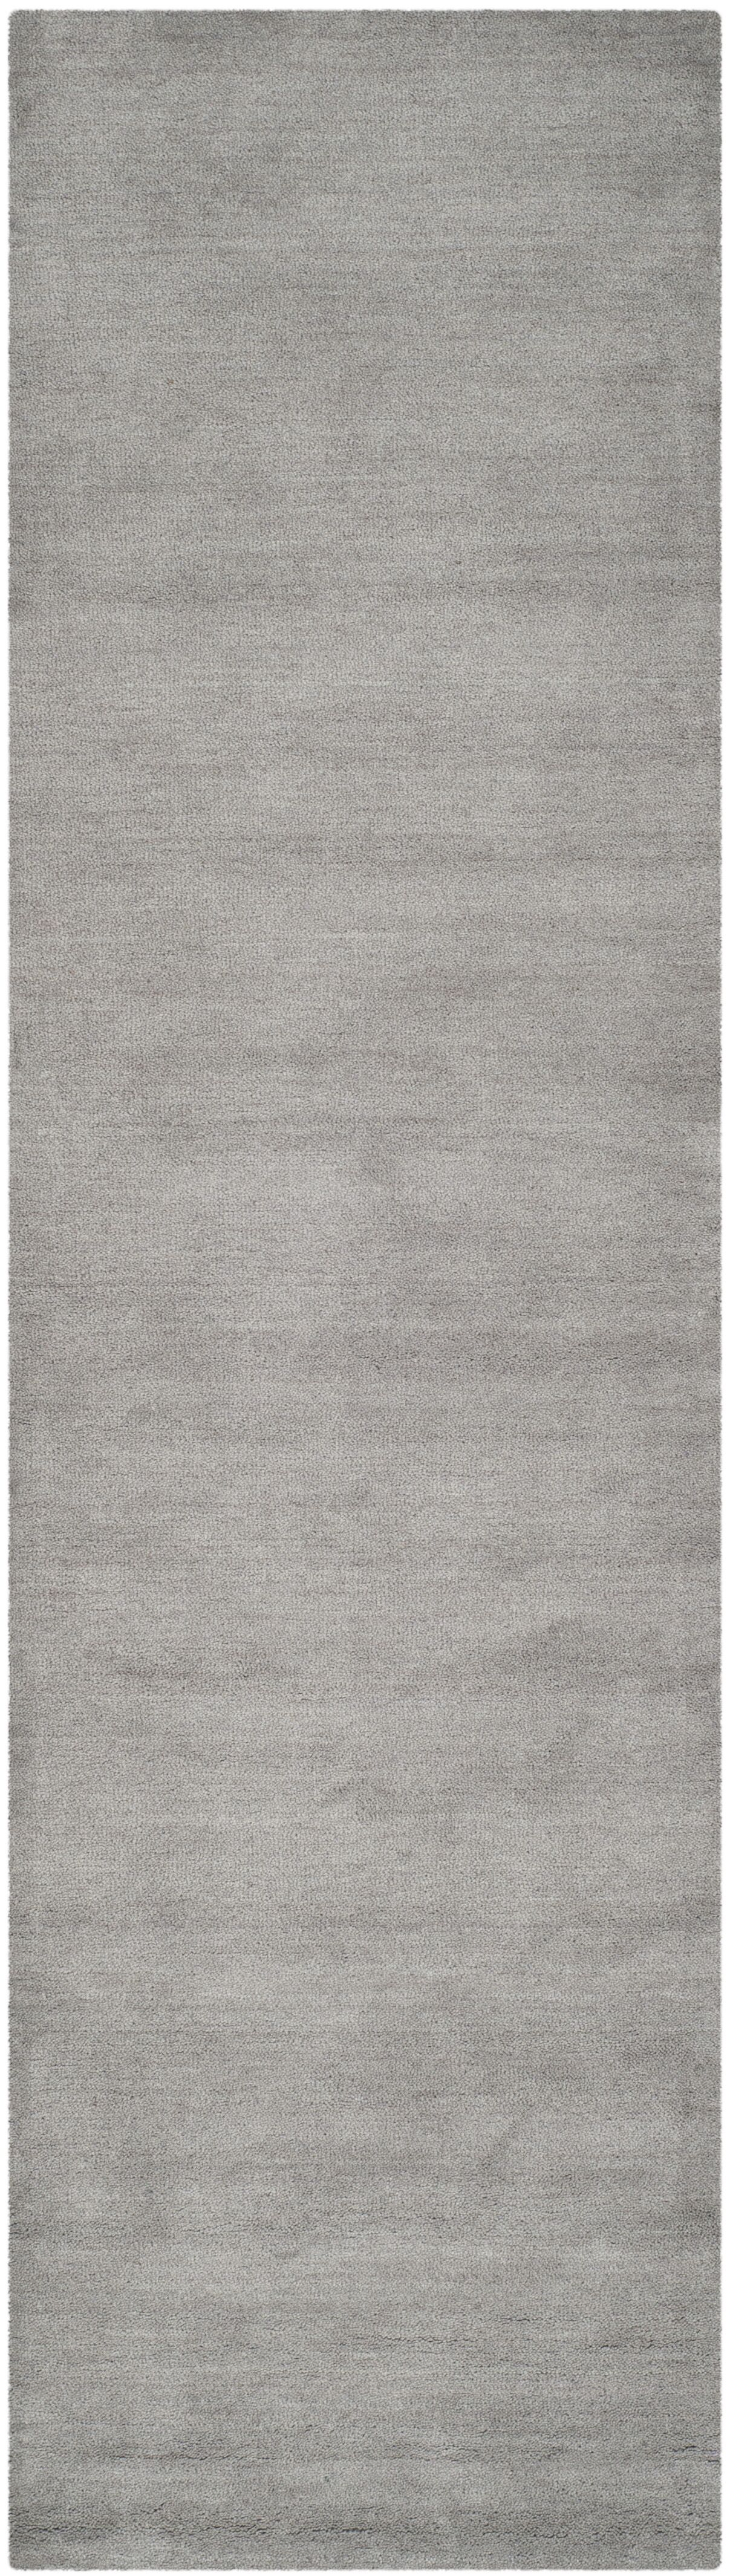 Bargo Hand-Woven Wool Grey Area Rug Rug Size: Runner 2'3